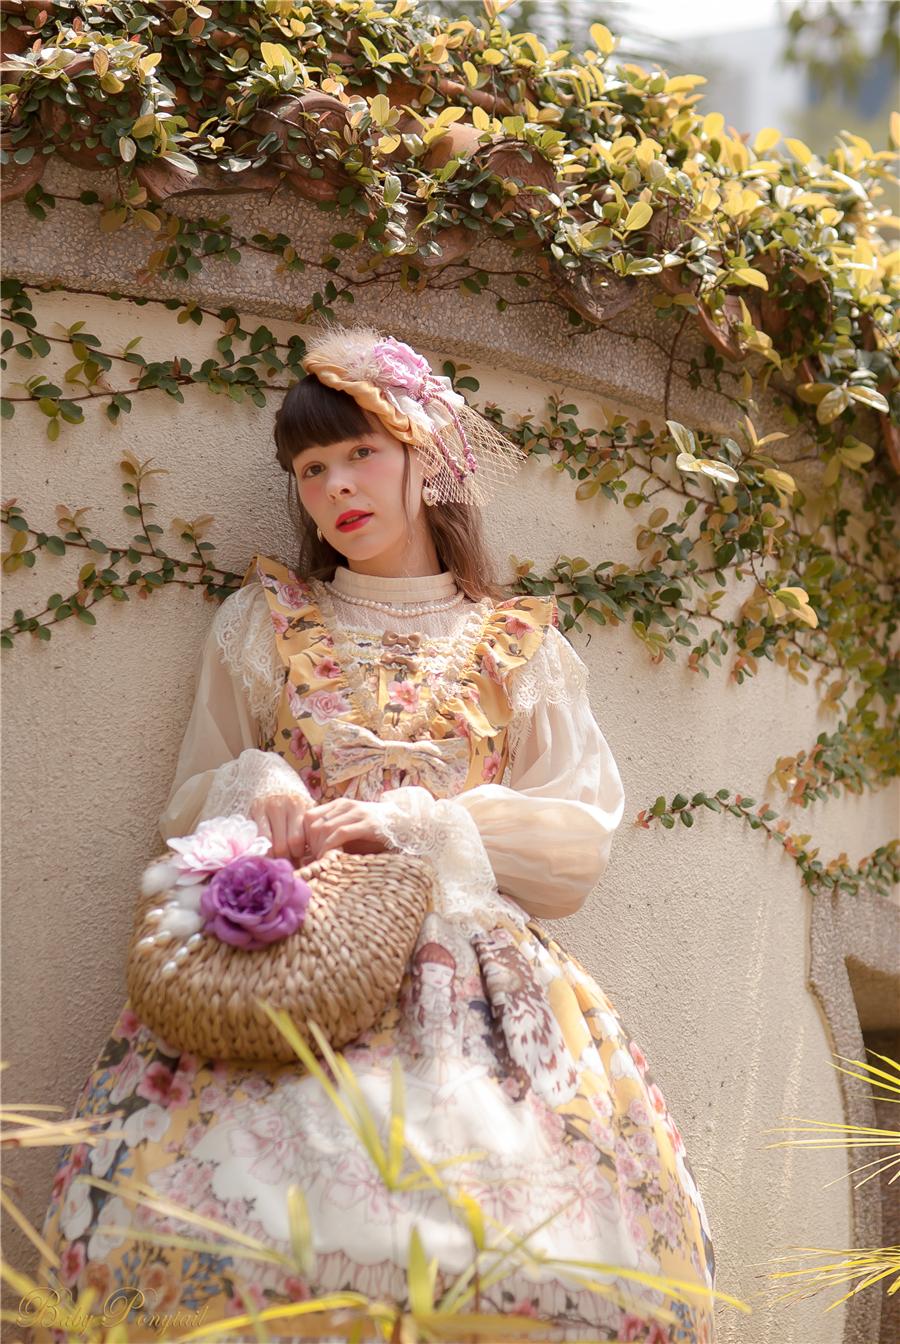 Baby Ponytail_Model Photo_Polly's Garden of Dreams_JSK Yellow_Claudia_13.jpg